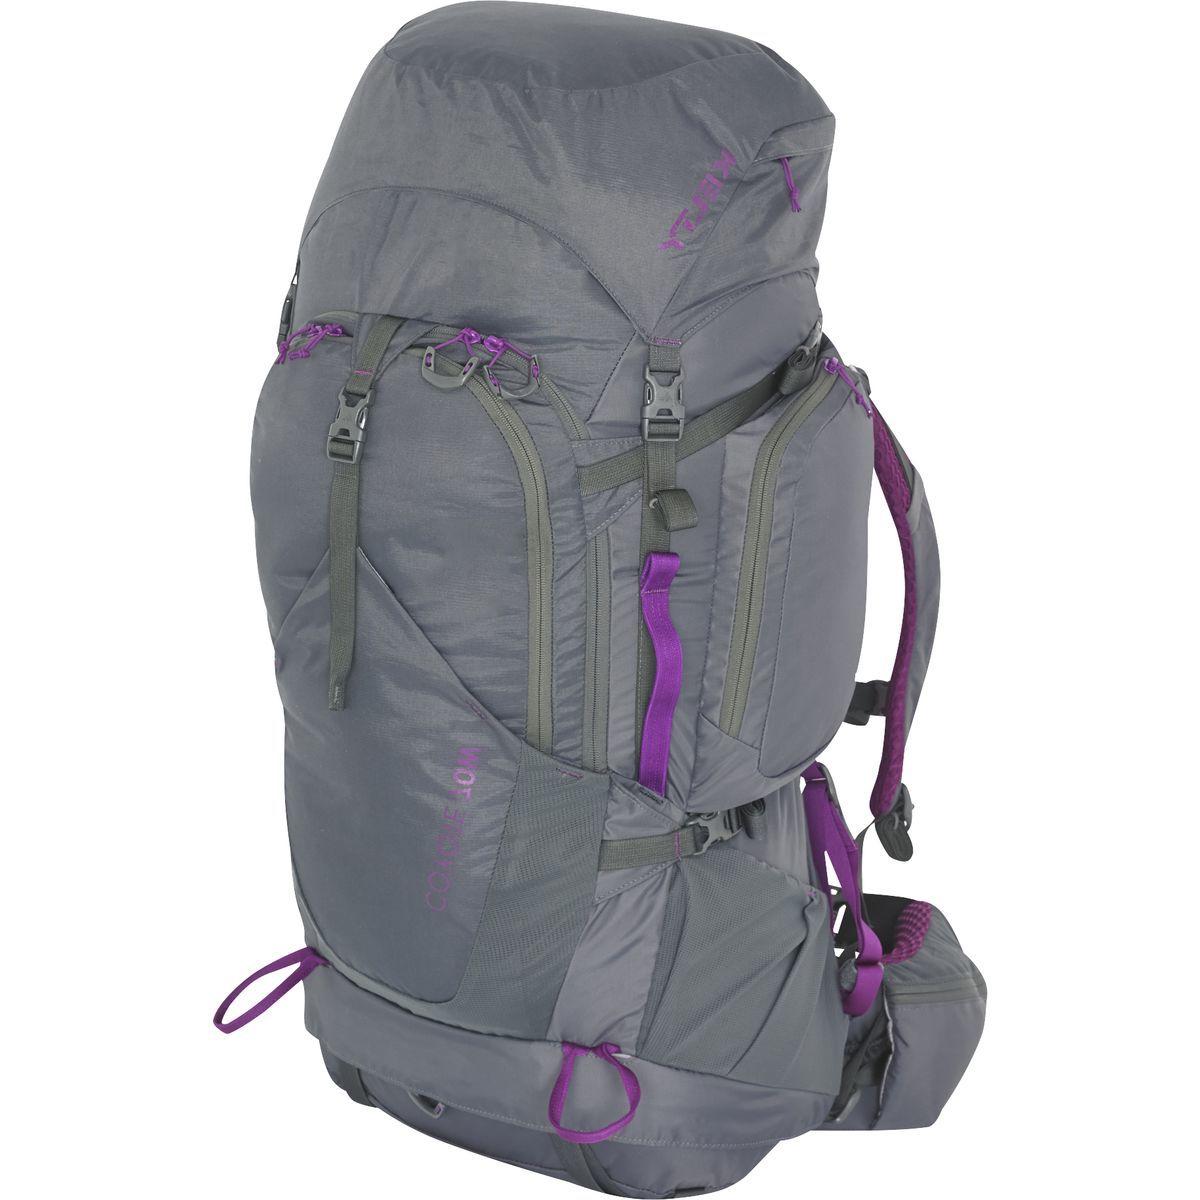 Kelty Coyote 70L Backpack - Women's